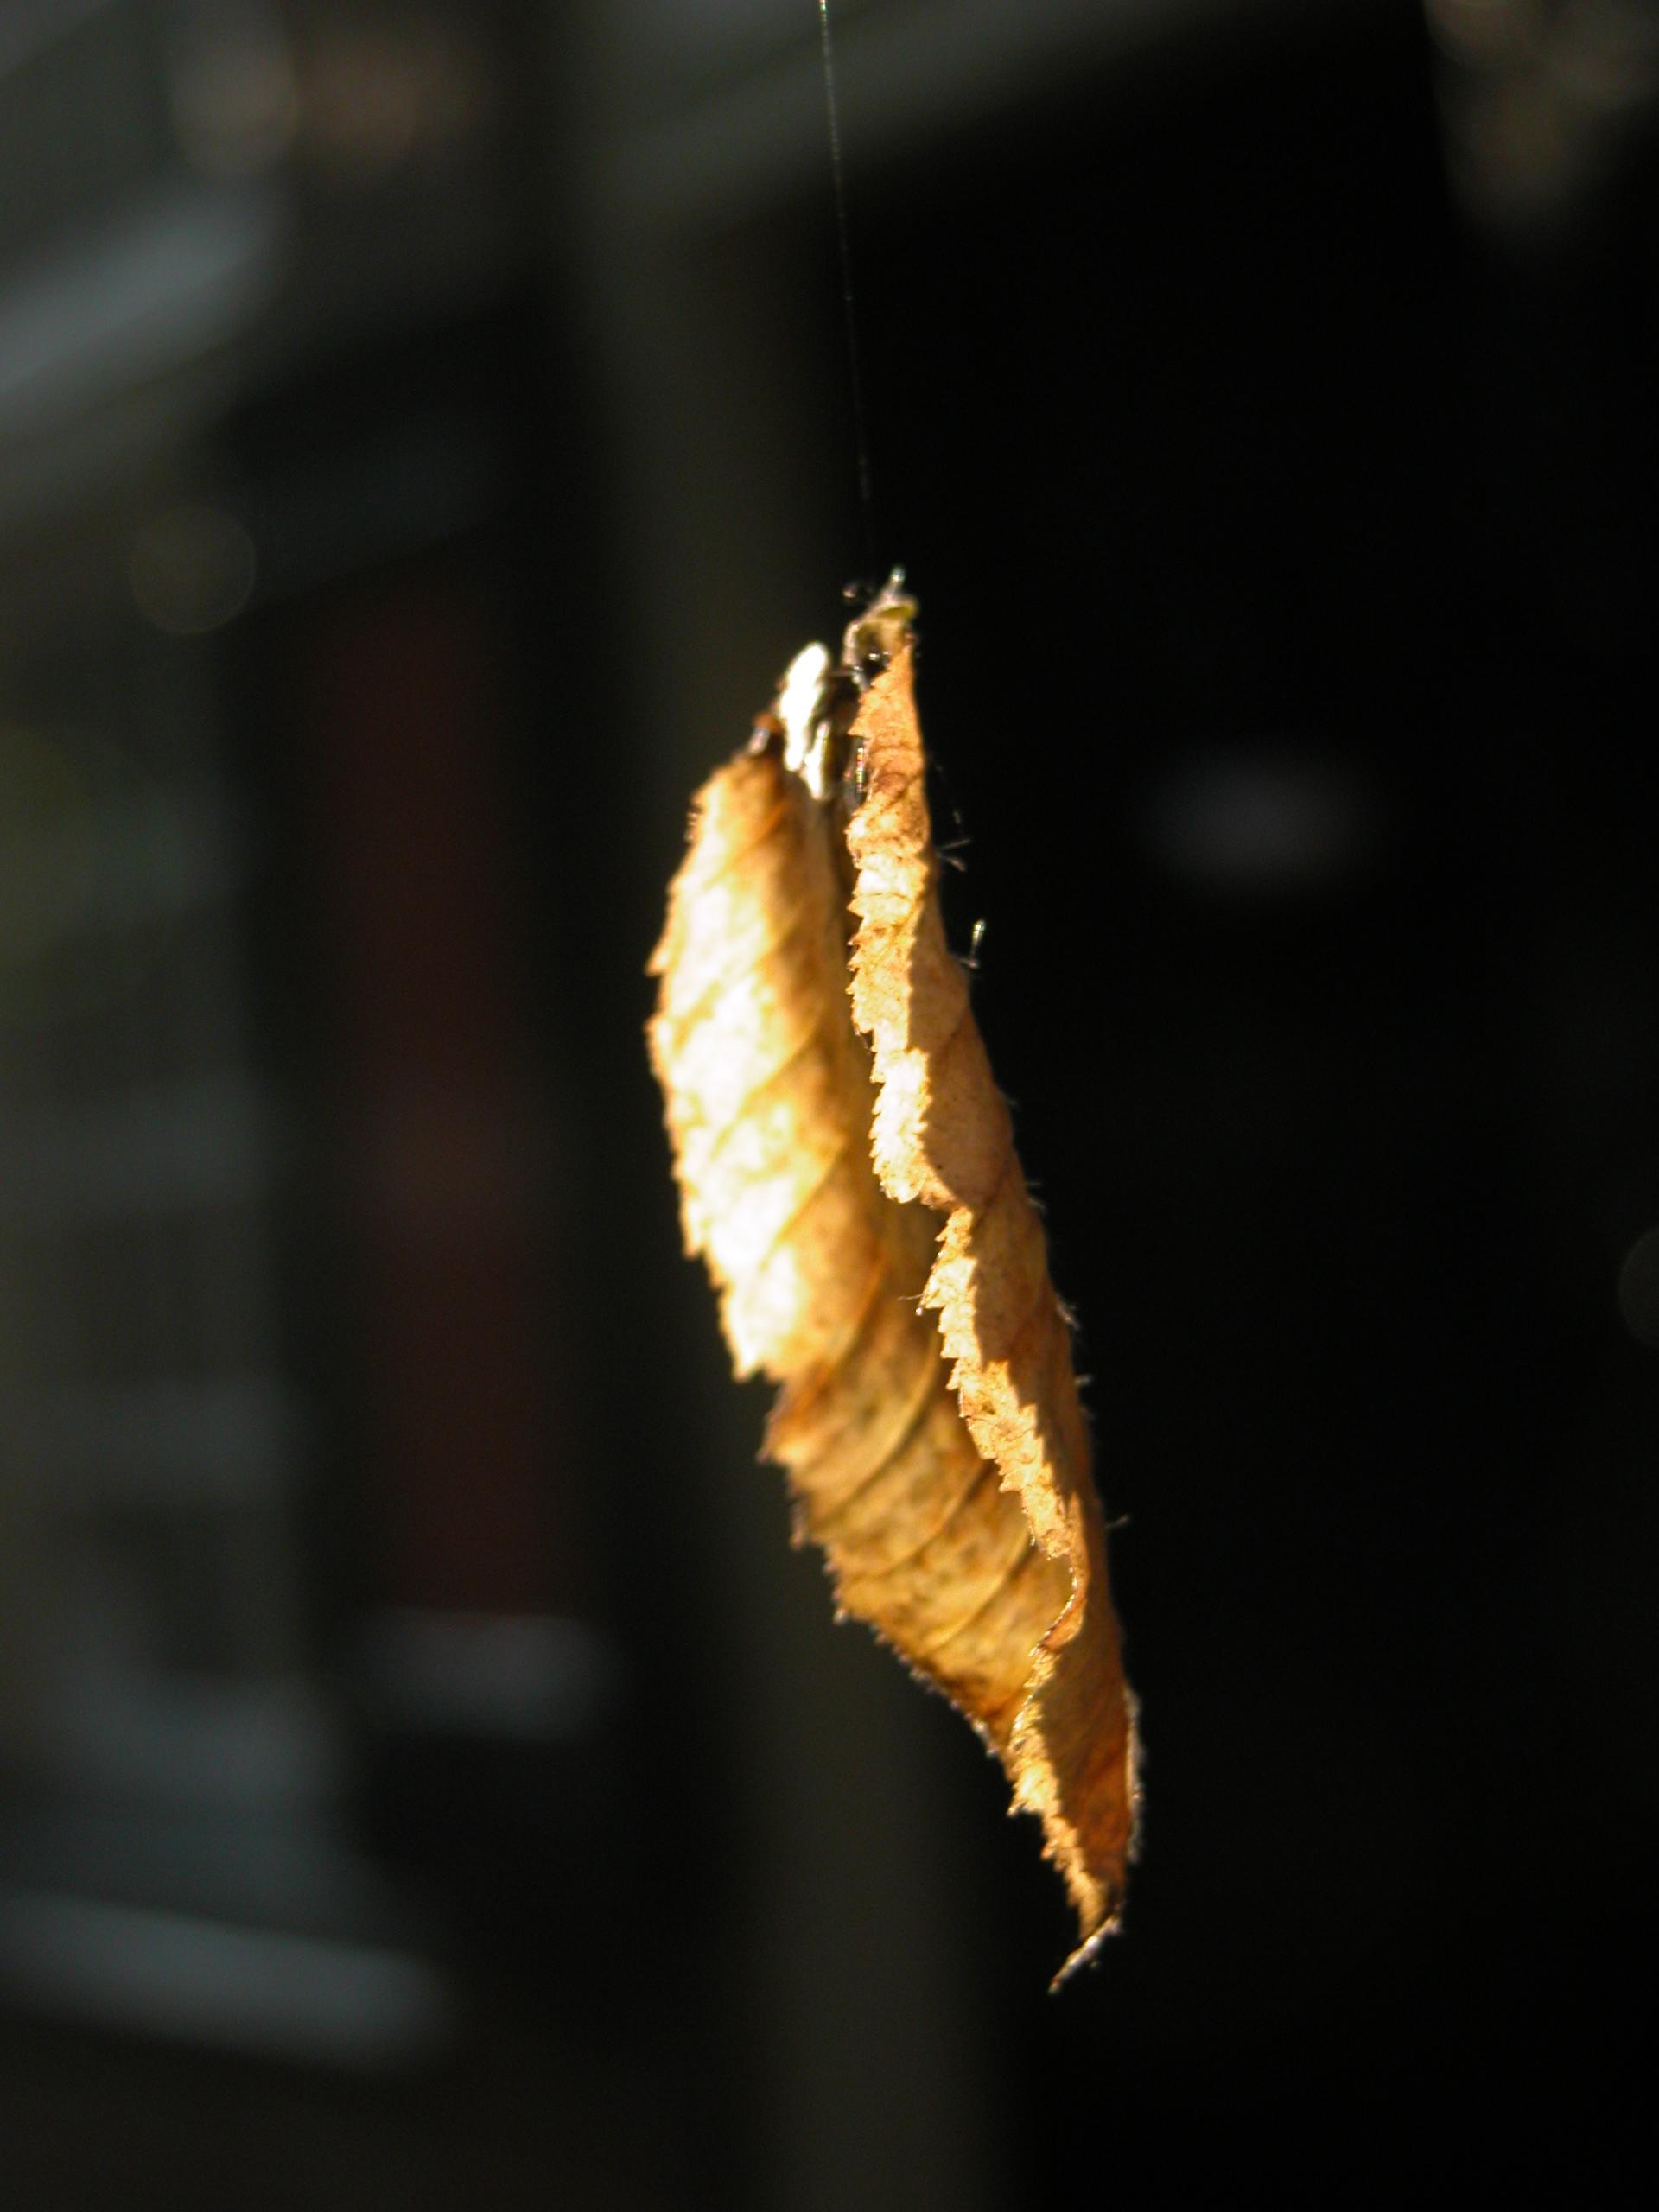 leaf suspended in air autumn